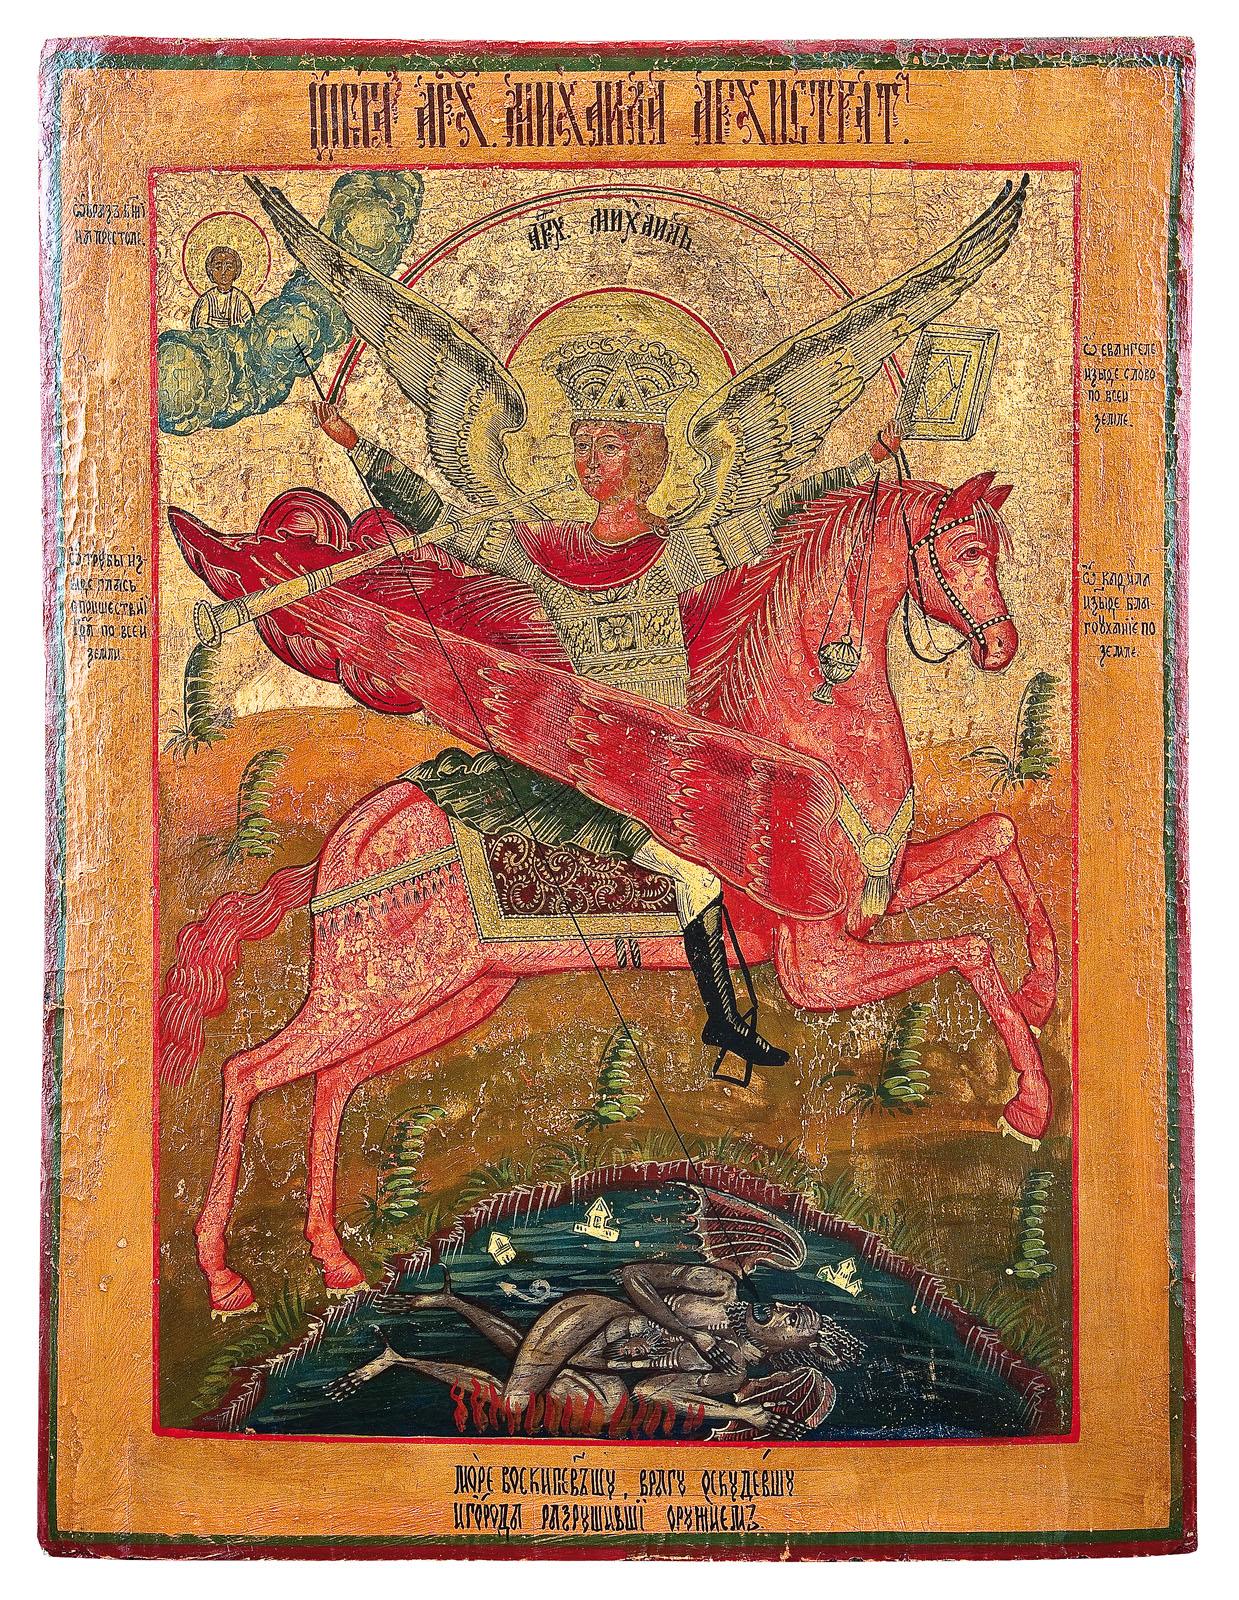 http://upload.wikimedia.org/wikipedia/commons/b/ba/Icon_of_saint_Michael_horseman_%28Russia%2C_19th_c.%2C_priv._coll.%29_2.jpg?uselang=ru